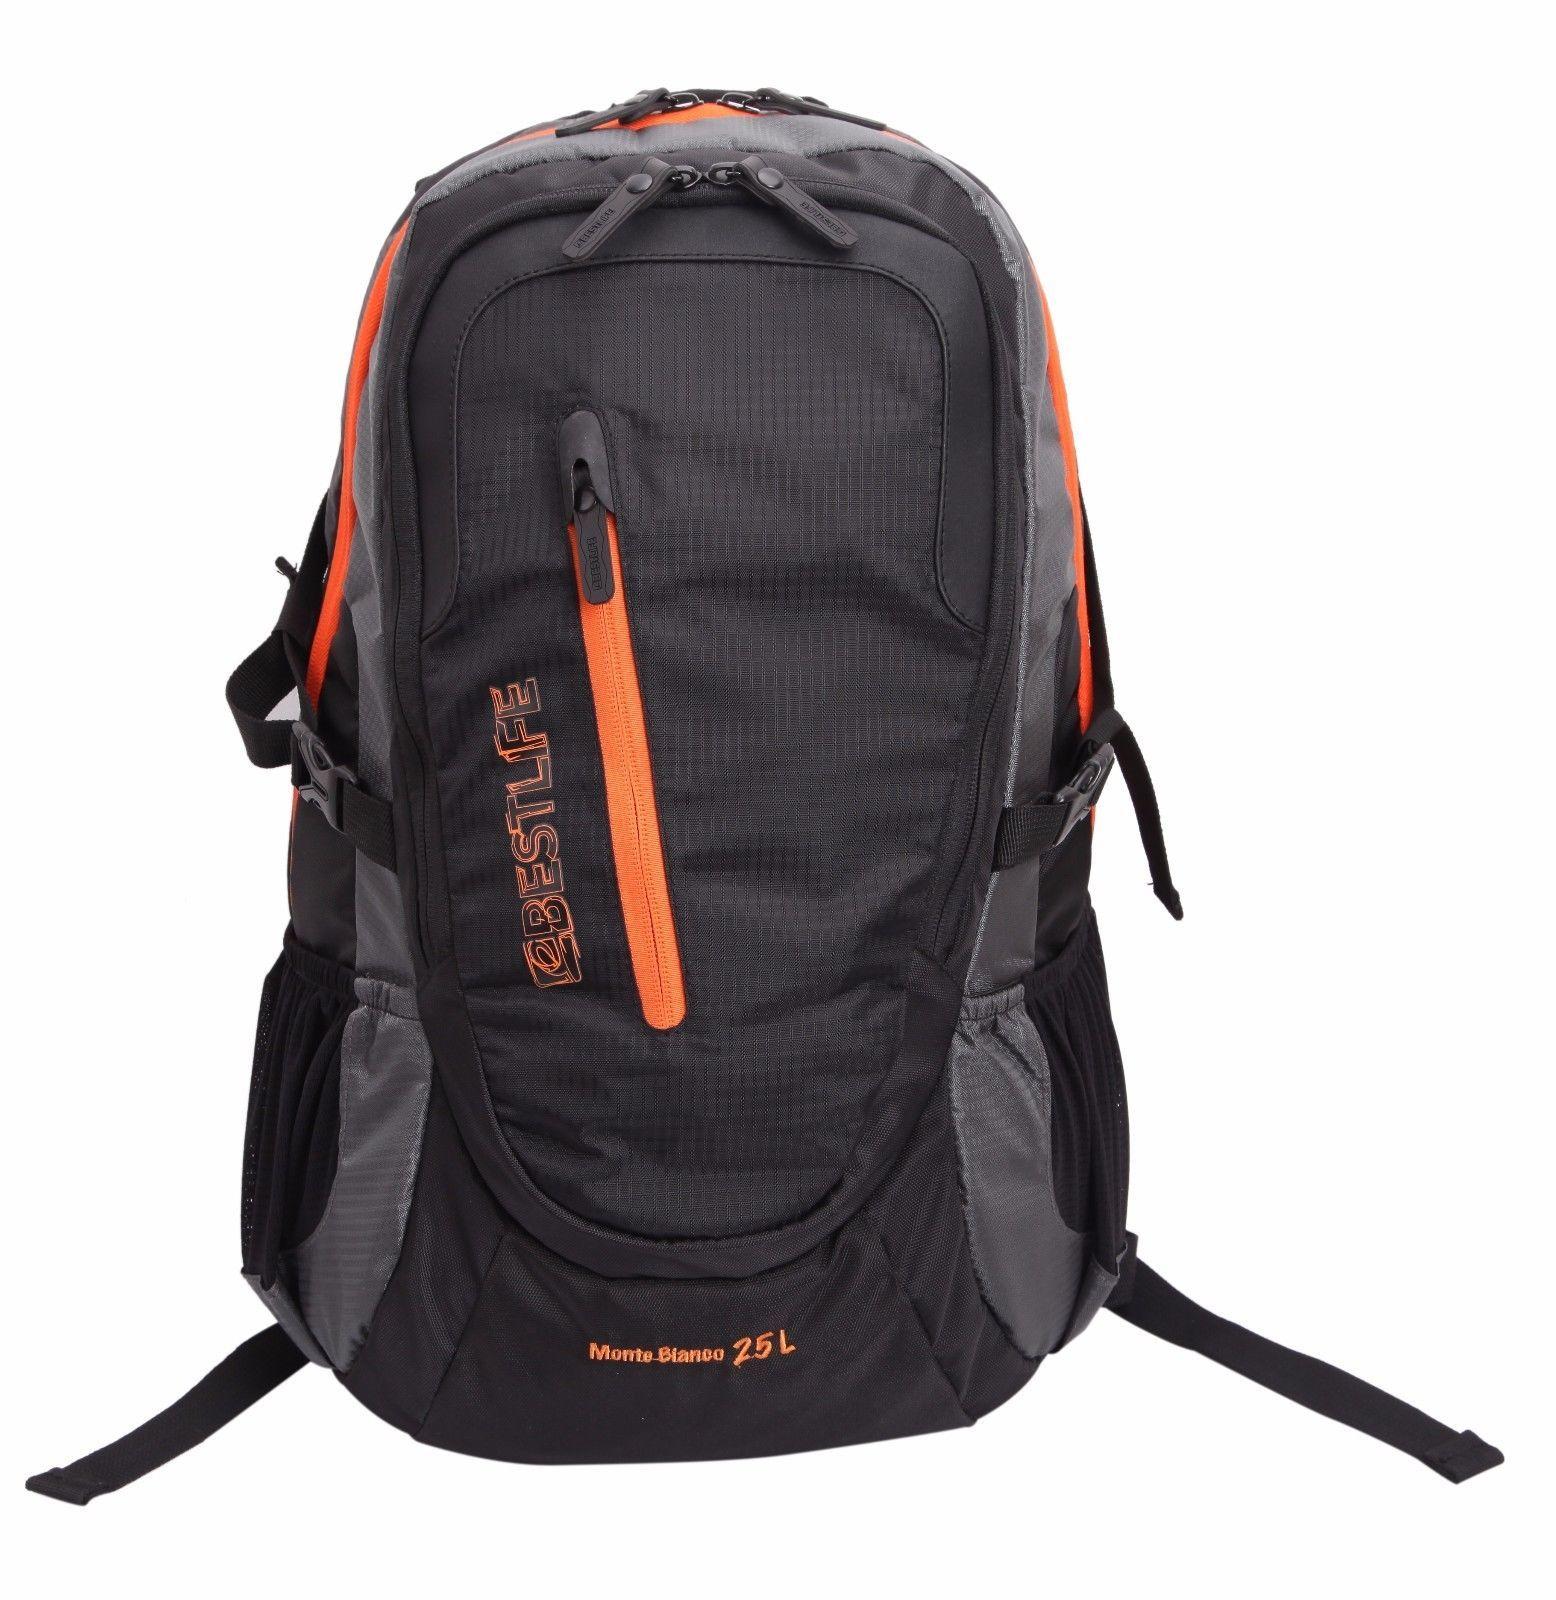 BESTLIFE Ergonomic Urban Backpack / Outdoor Traveler Bag Daypack BLB 3076 / 3010